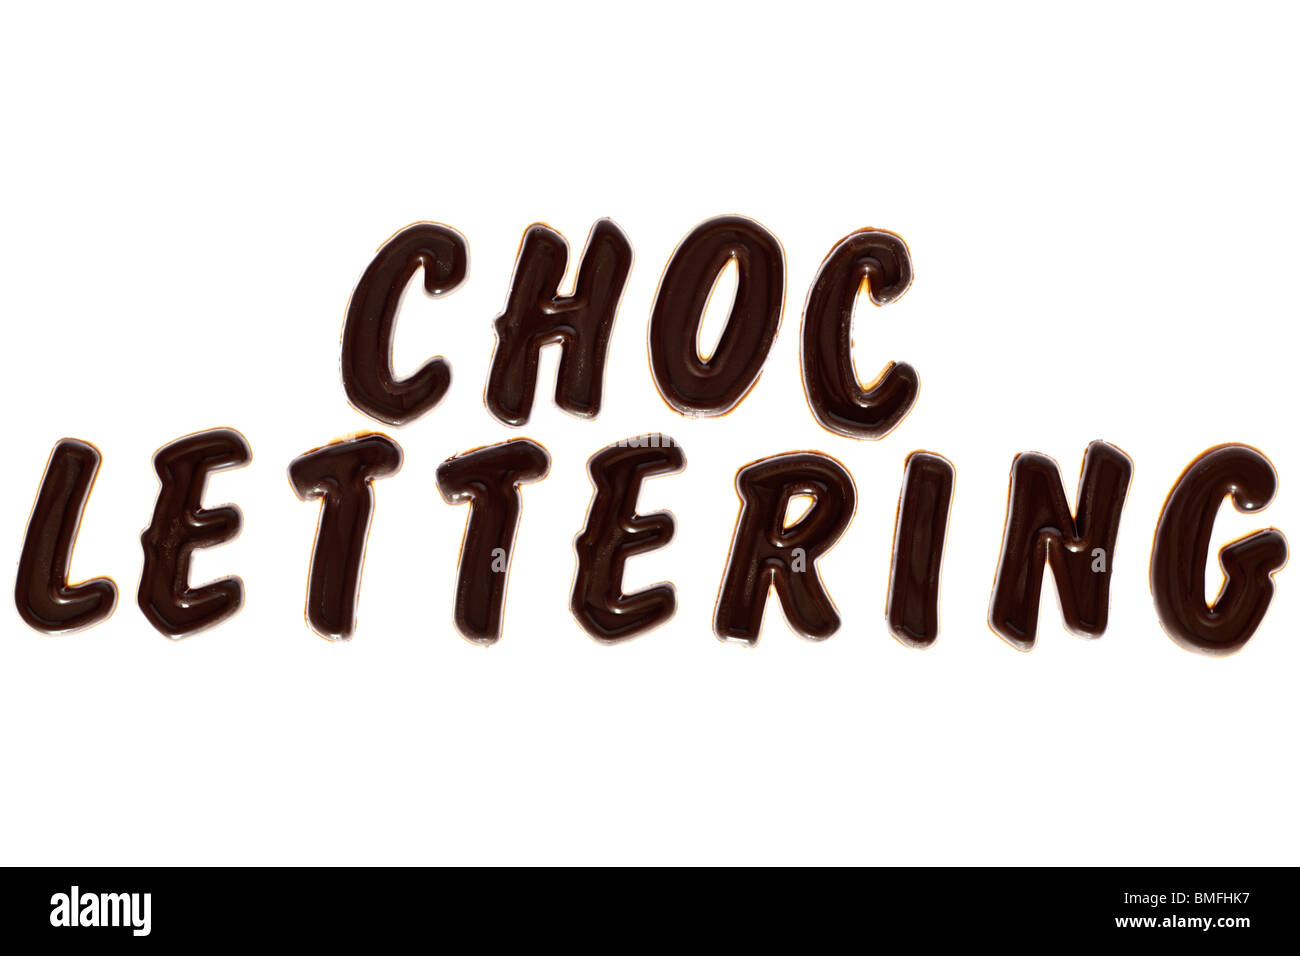 Choc capital lettering - Stock Image